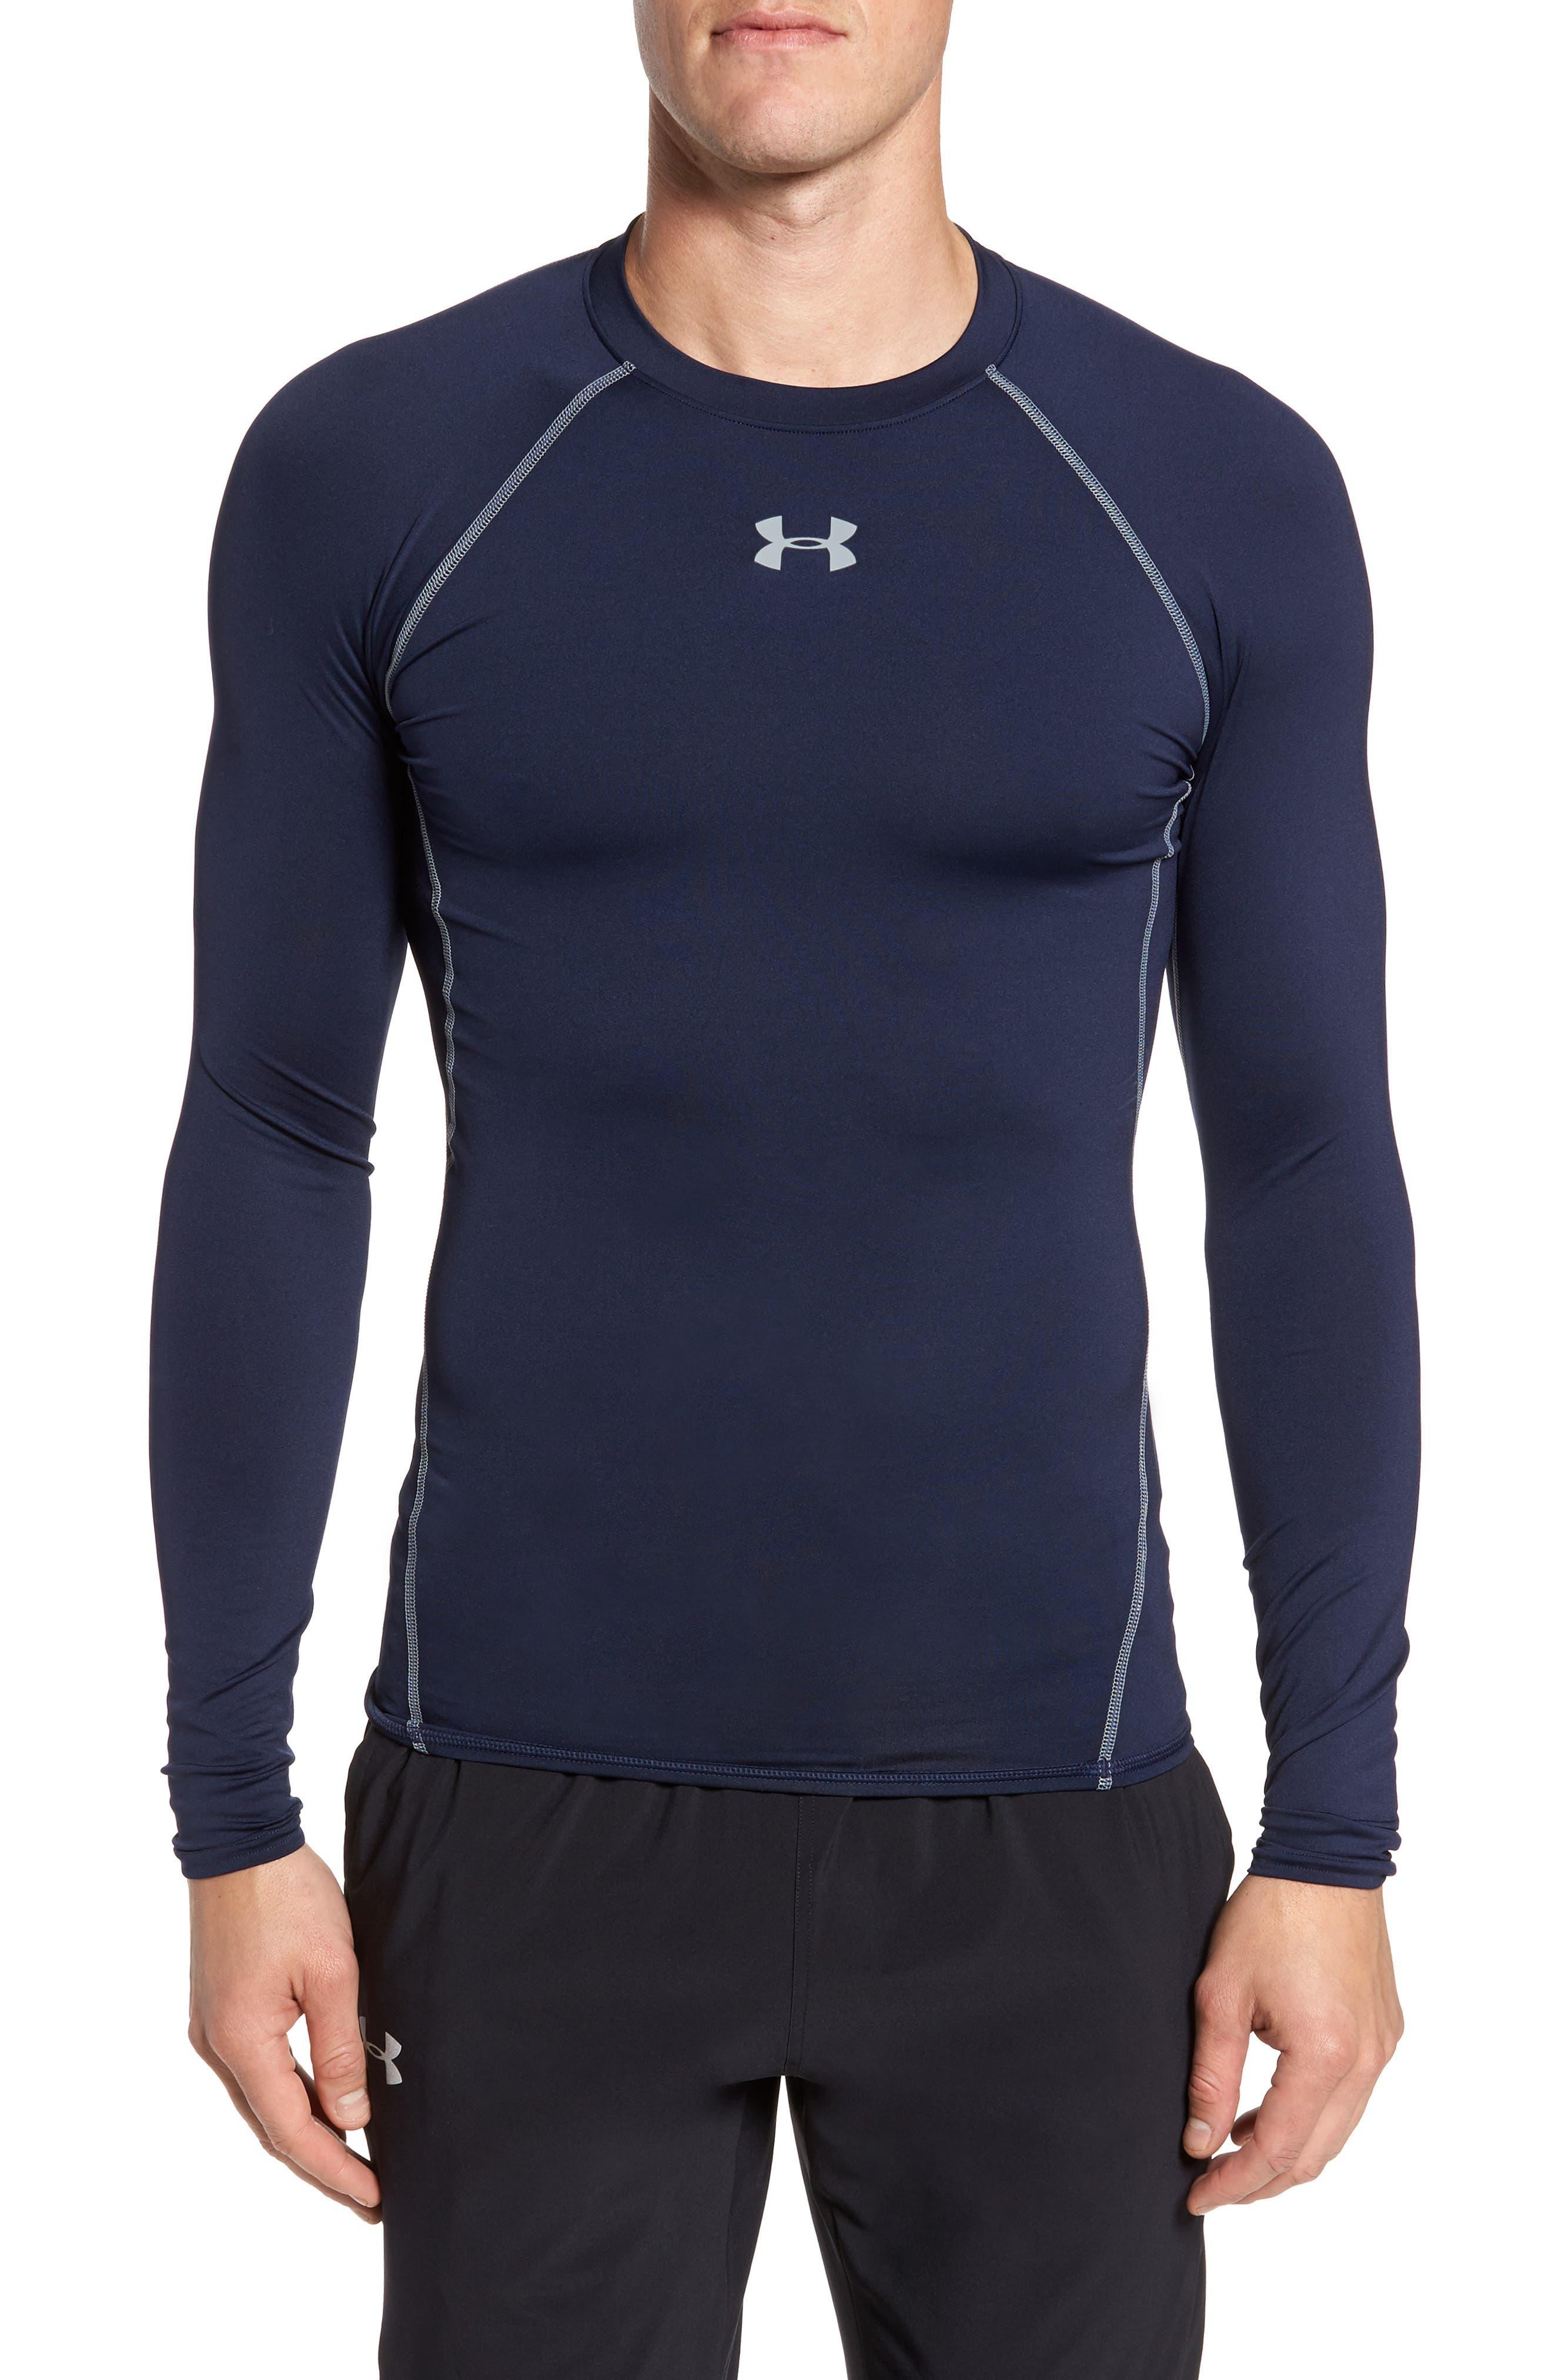 Under Armour Heatgear Compression Fit Long Sleeve T-Shirt, Blue